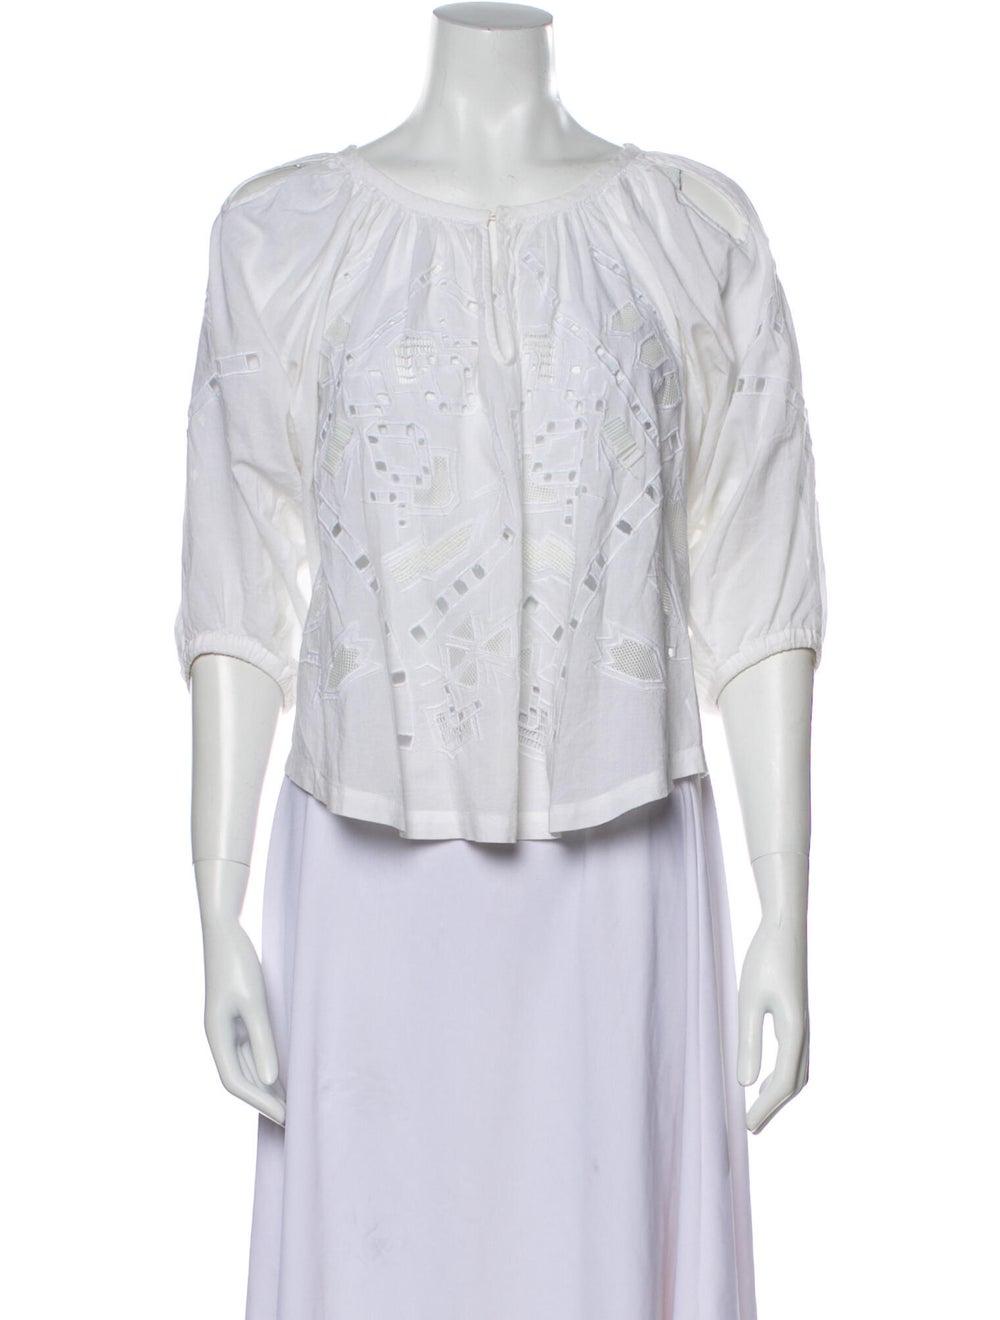 Iro Lace Pattern Scoop Neck Blouse White - image 1